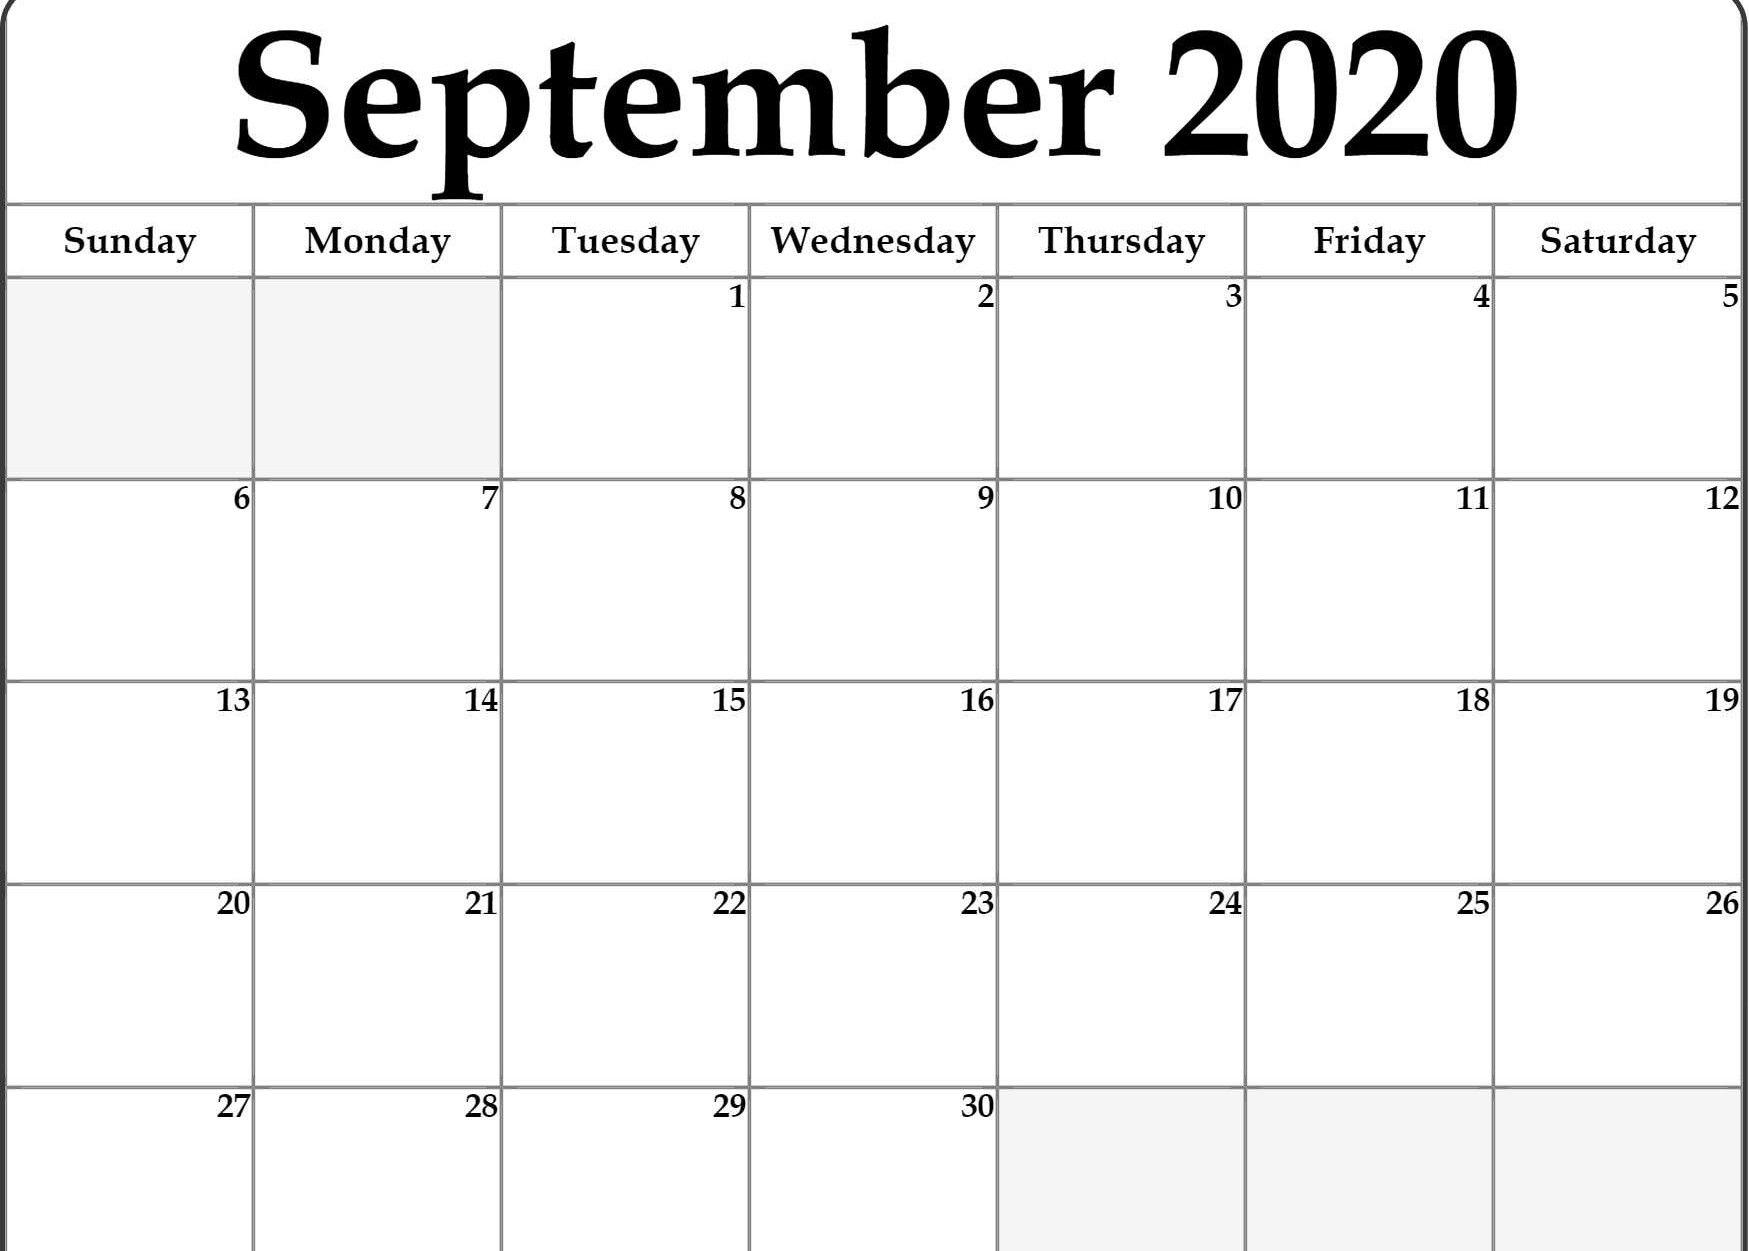 September 2020 Calendar Printable | Calendar Printables